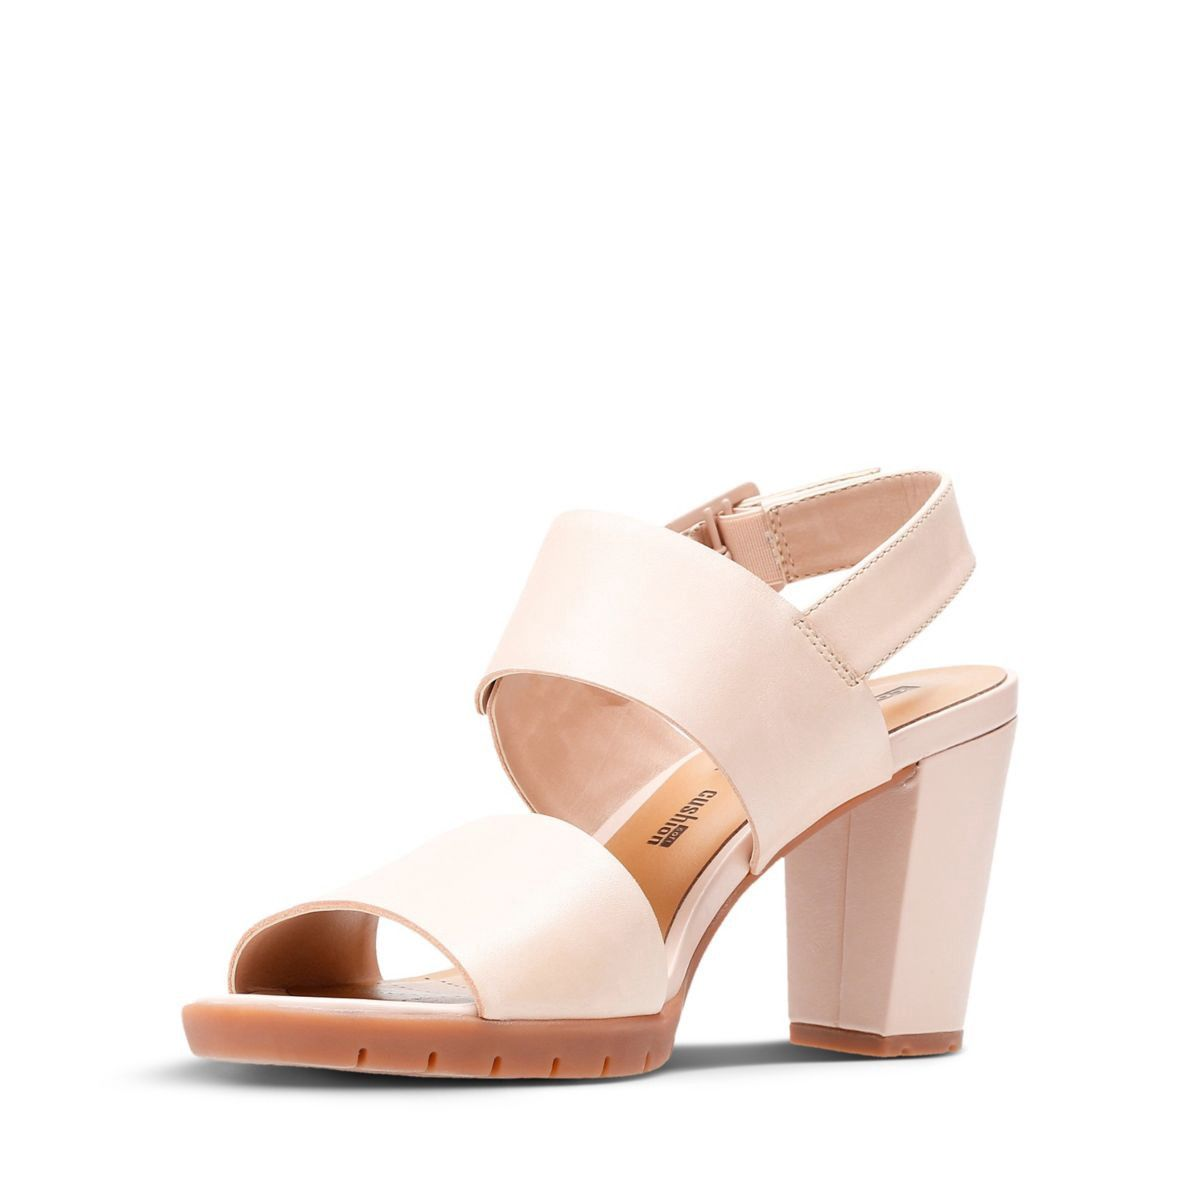 51291662c785 Clarks Kurtley Shine - Womens Sandals Dusty Pink 7.5